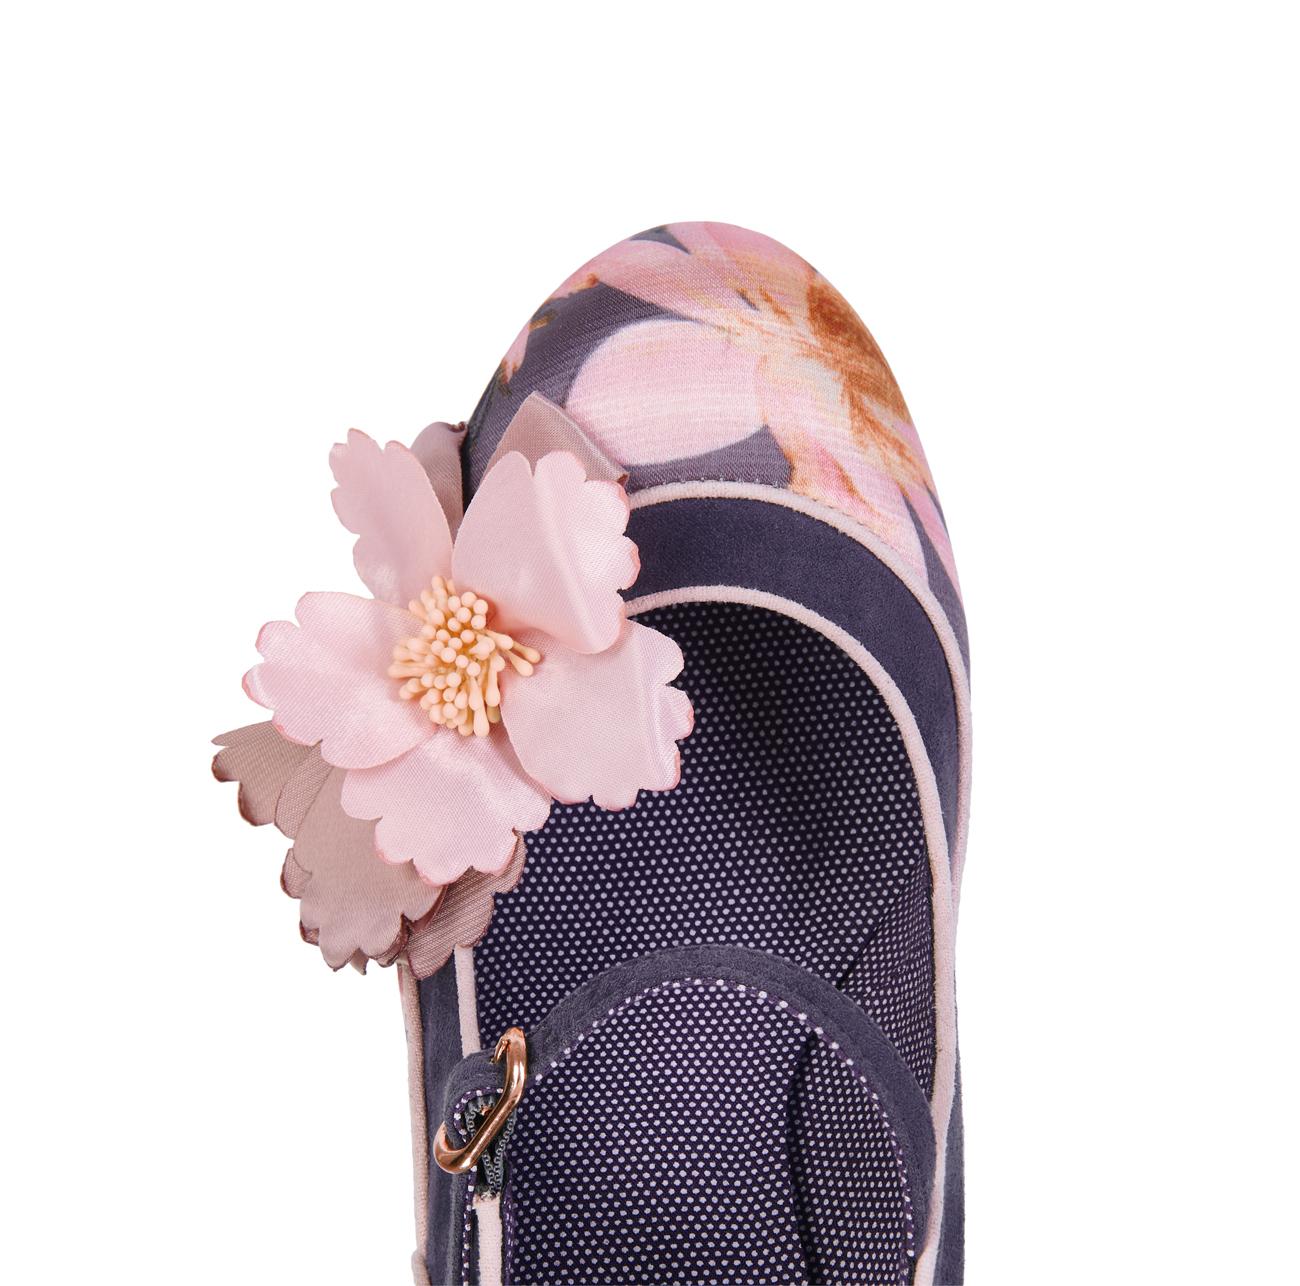 Ruby Shoo Madelaine Mid-Scarpe Mary Jane Tacco UK3-9 EU36-42 Argento Da Sposa Crema